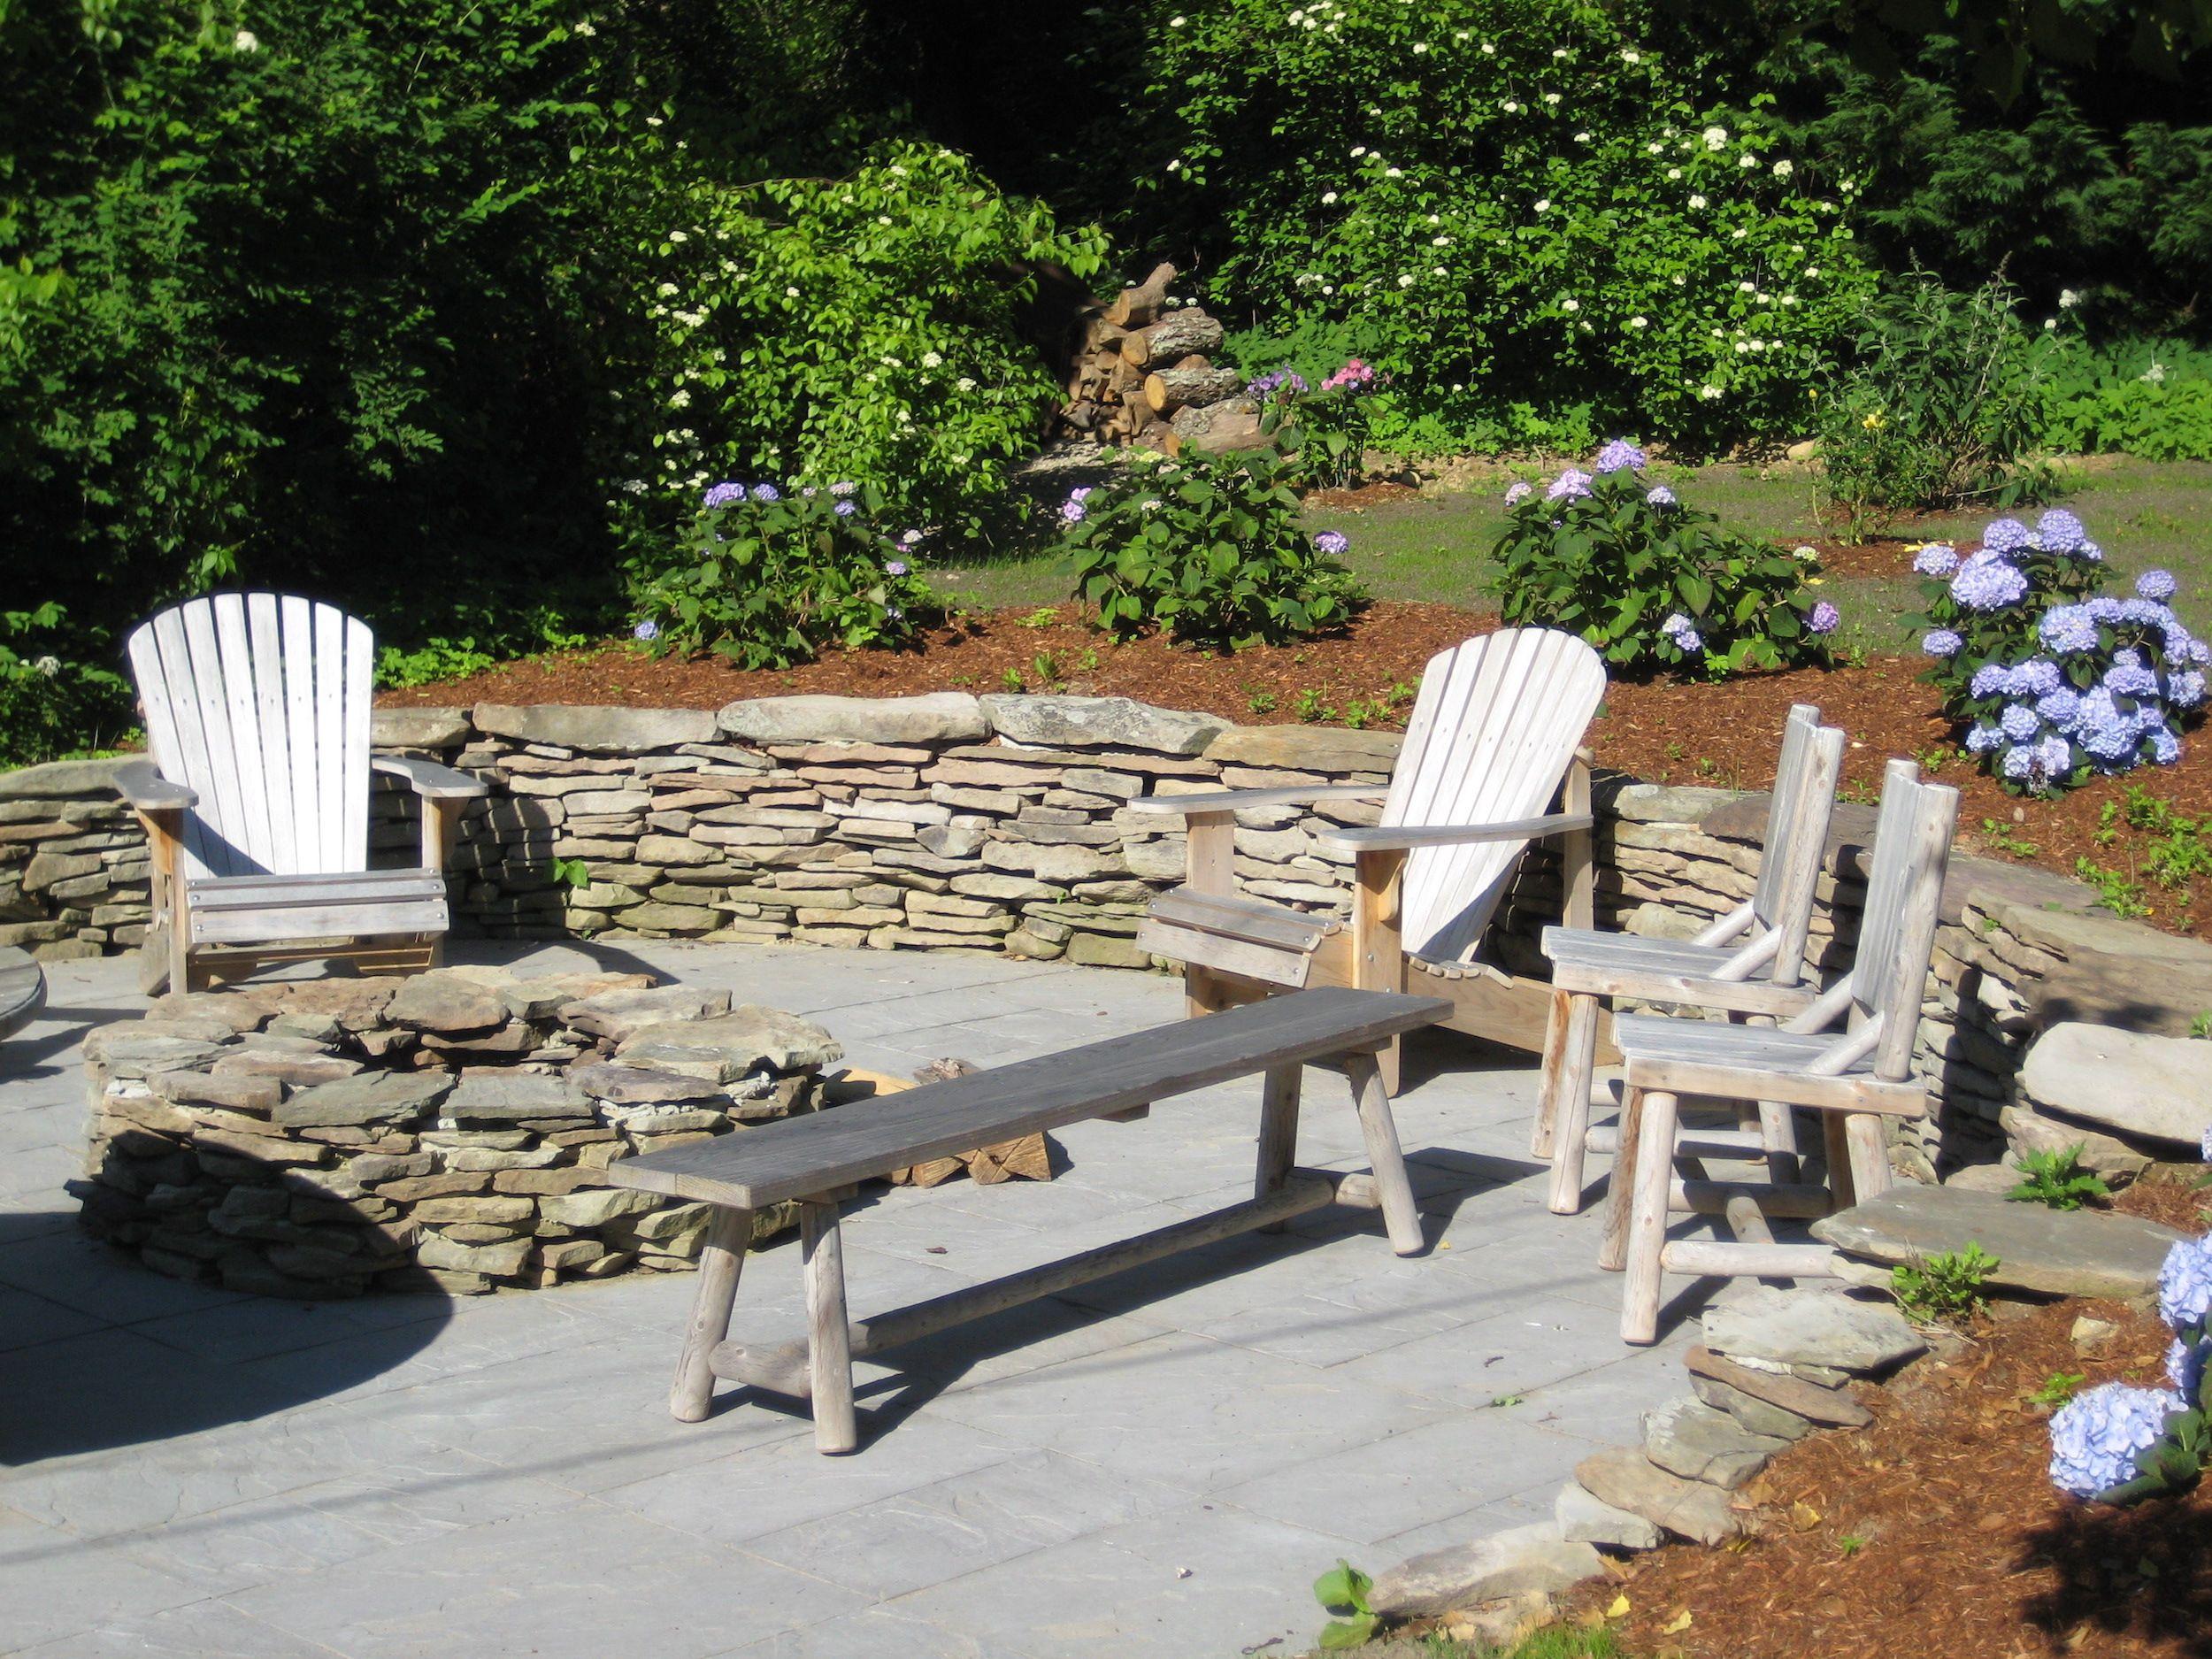 17 Landscaping Ideas For A Low-Maintenance Yard on Low Maintenance Backyard Design  id=63796